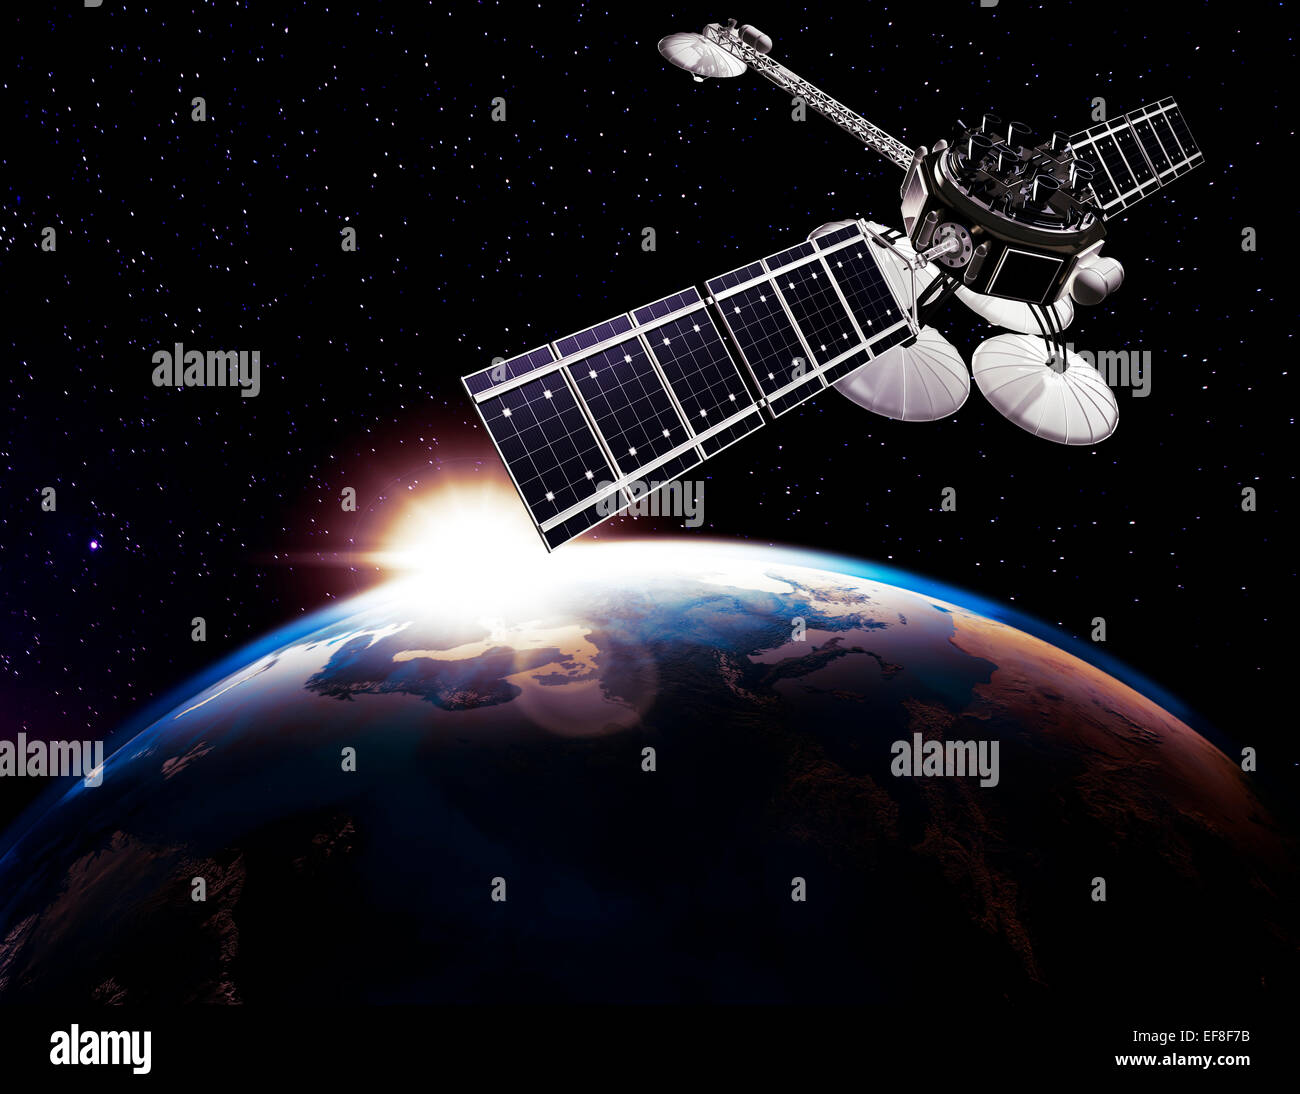 Comunicación satelital, Comsat encima de globo terráqueo iluminado por el sol negro sobre fondo de cielo Imagen De Stock